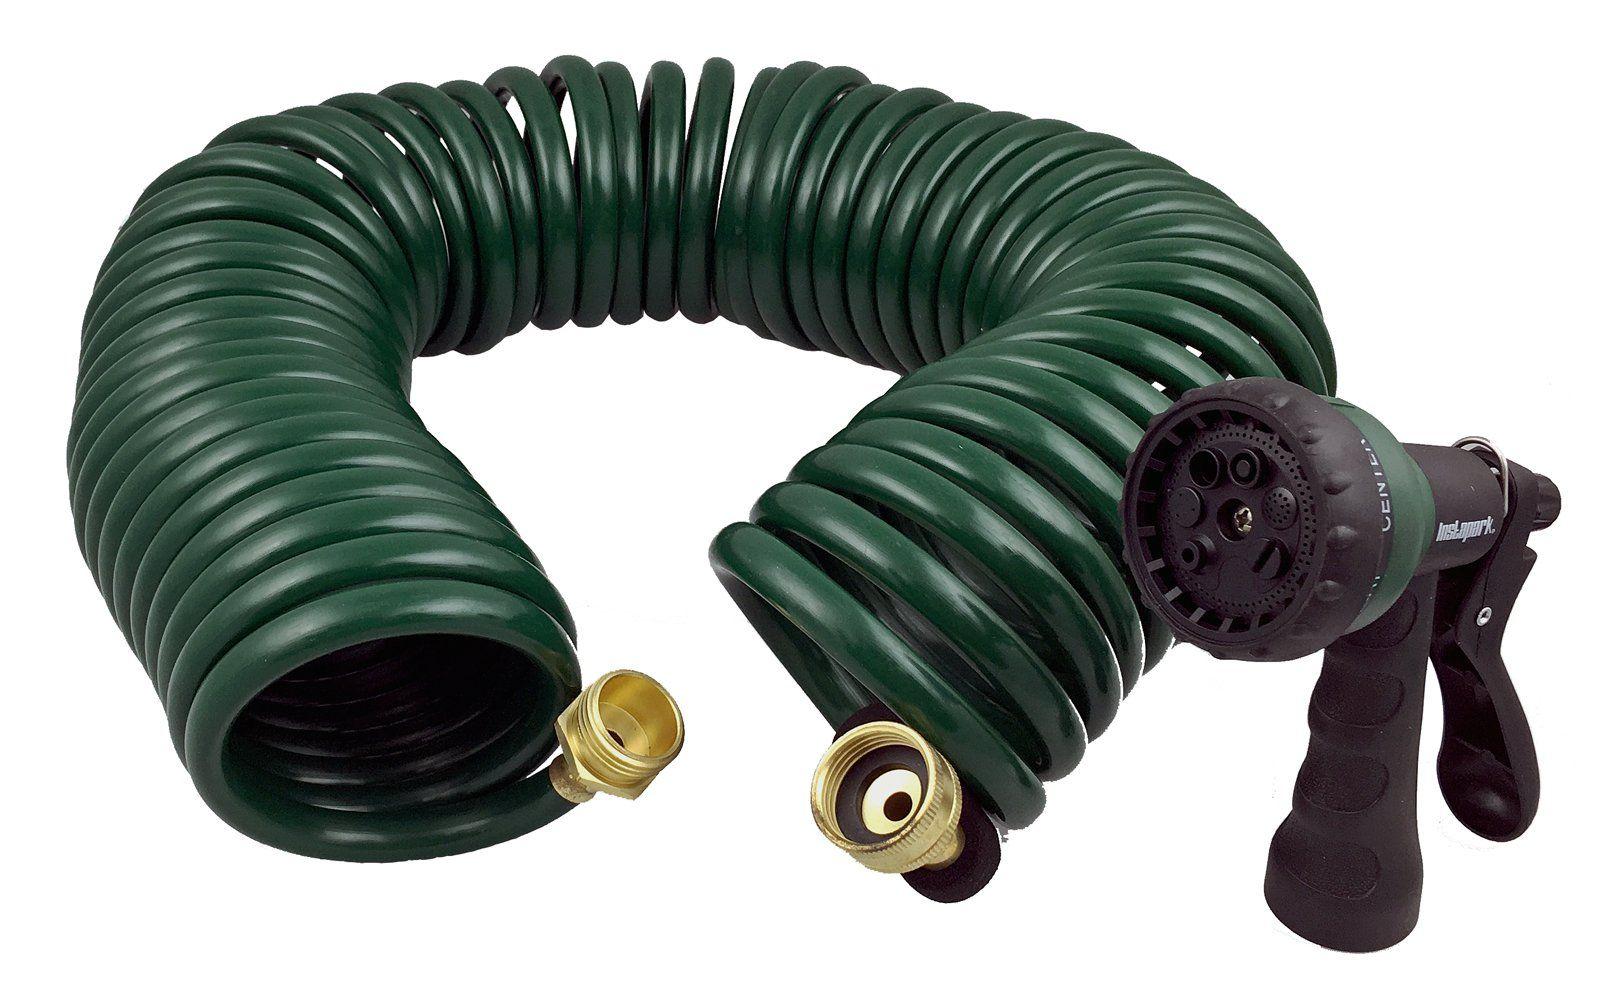 Instapark GHN06 HeavyDuty EVA Recoil Garden Hose with